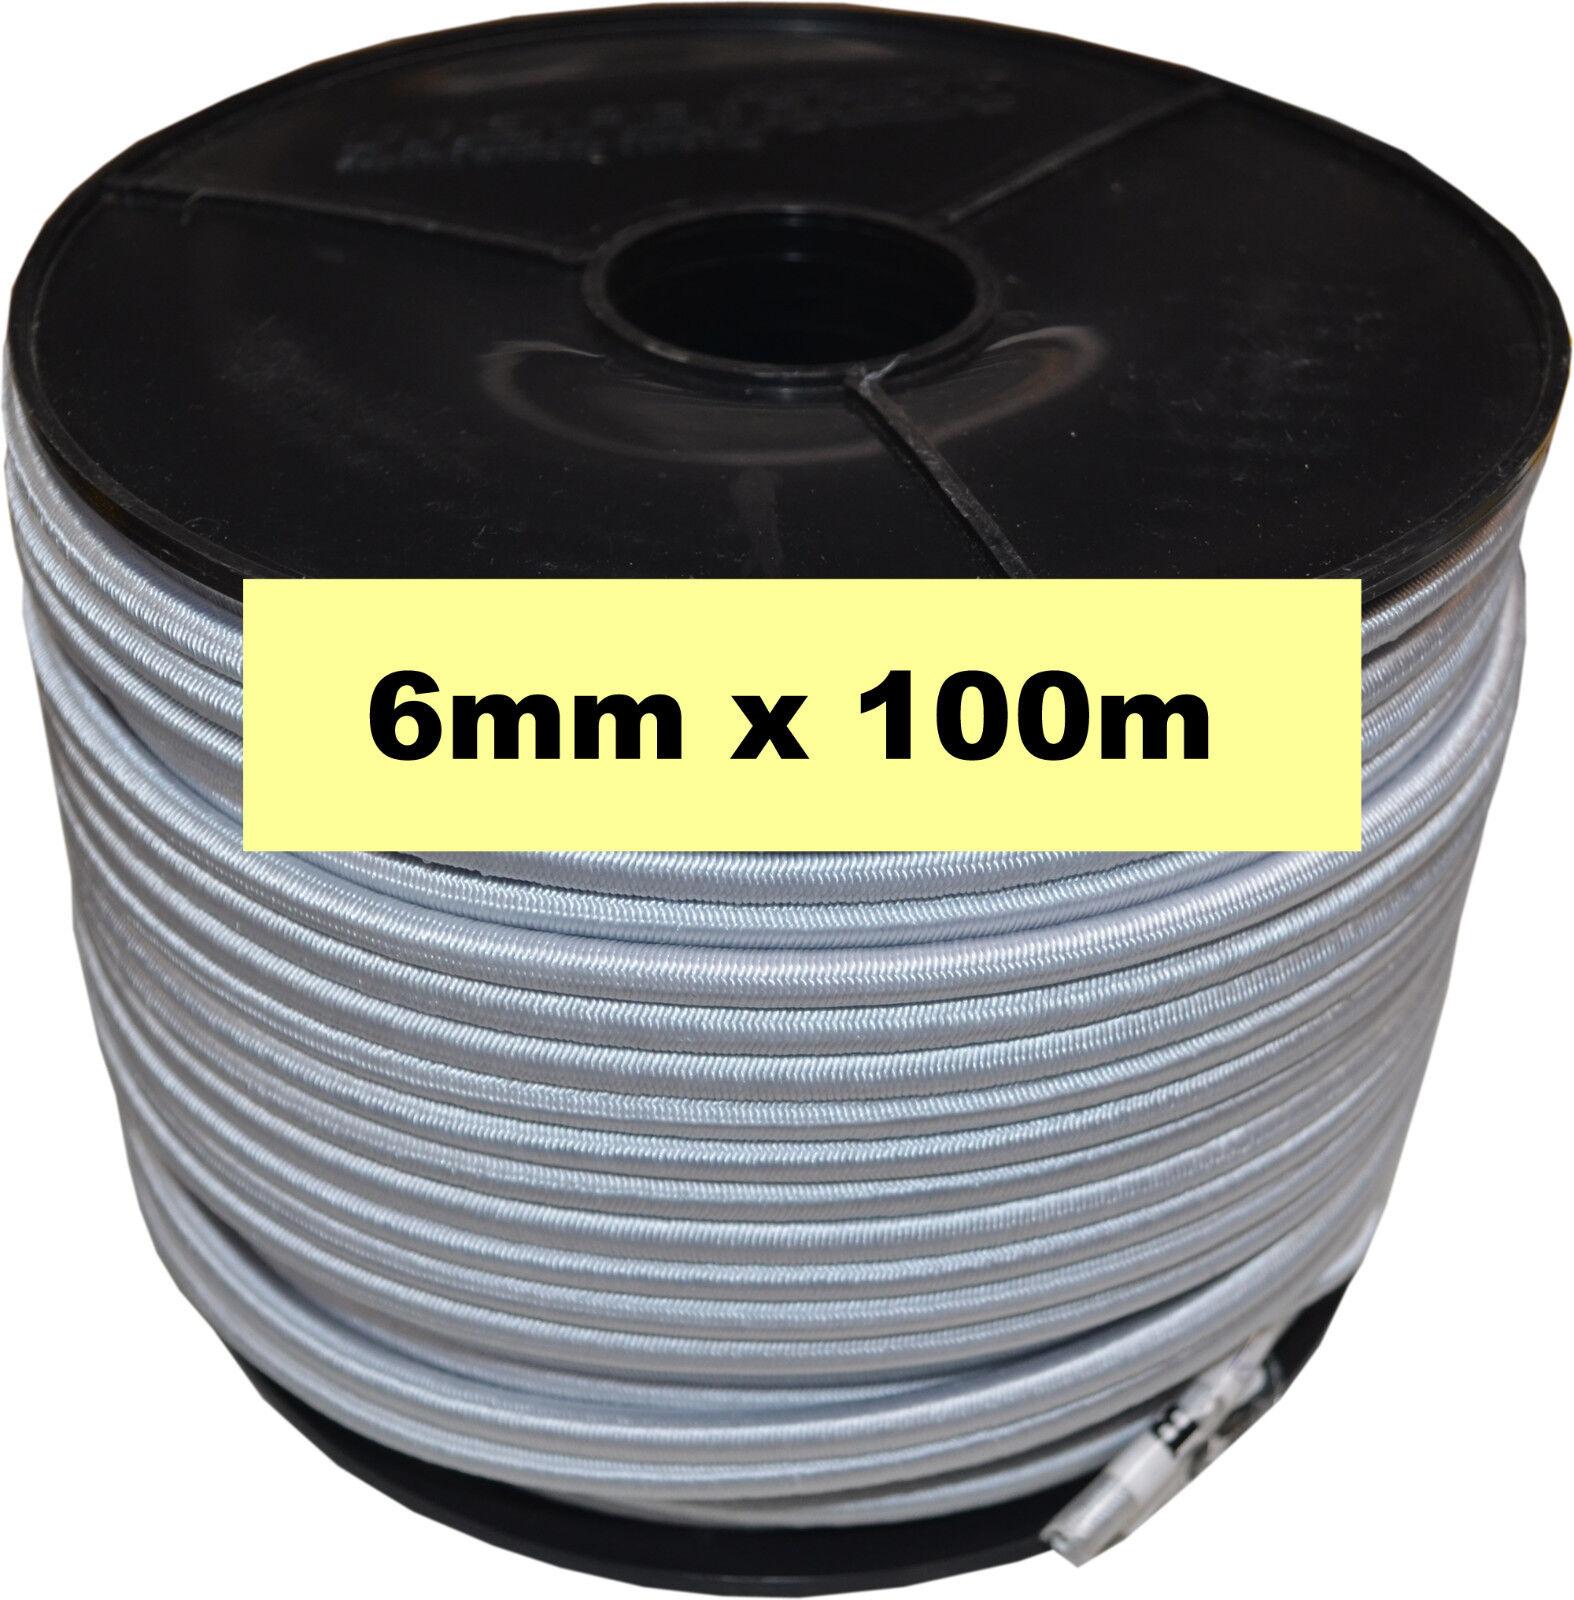 Bungee Cord White Monoflex 6mm x 100 Metres Roll